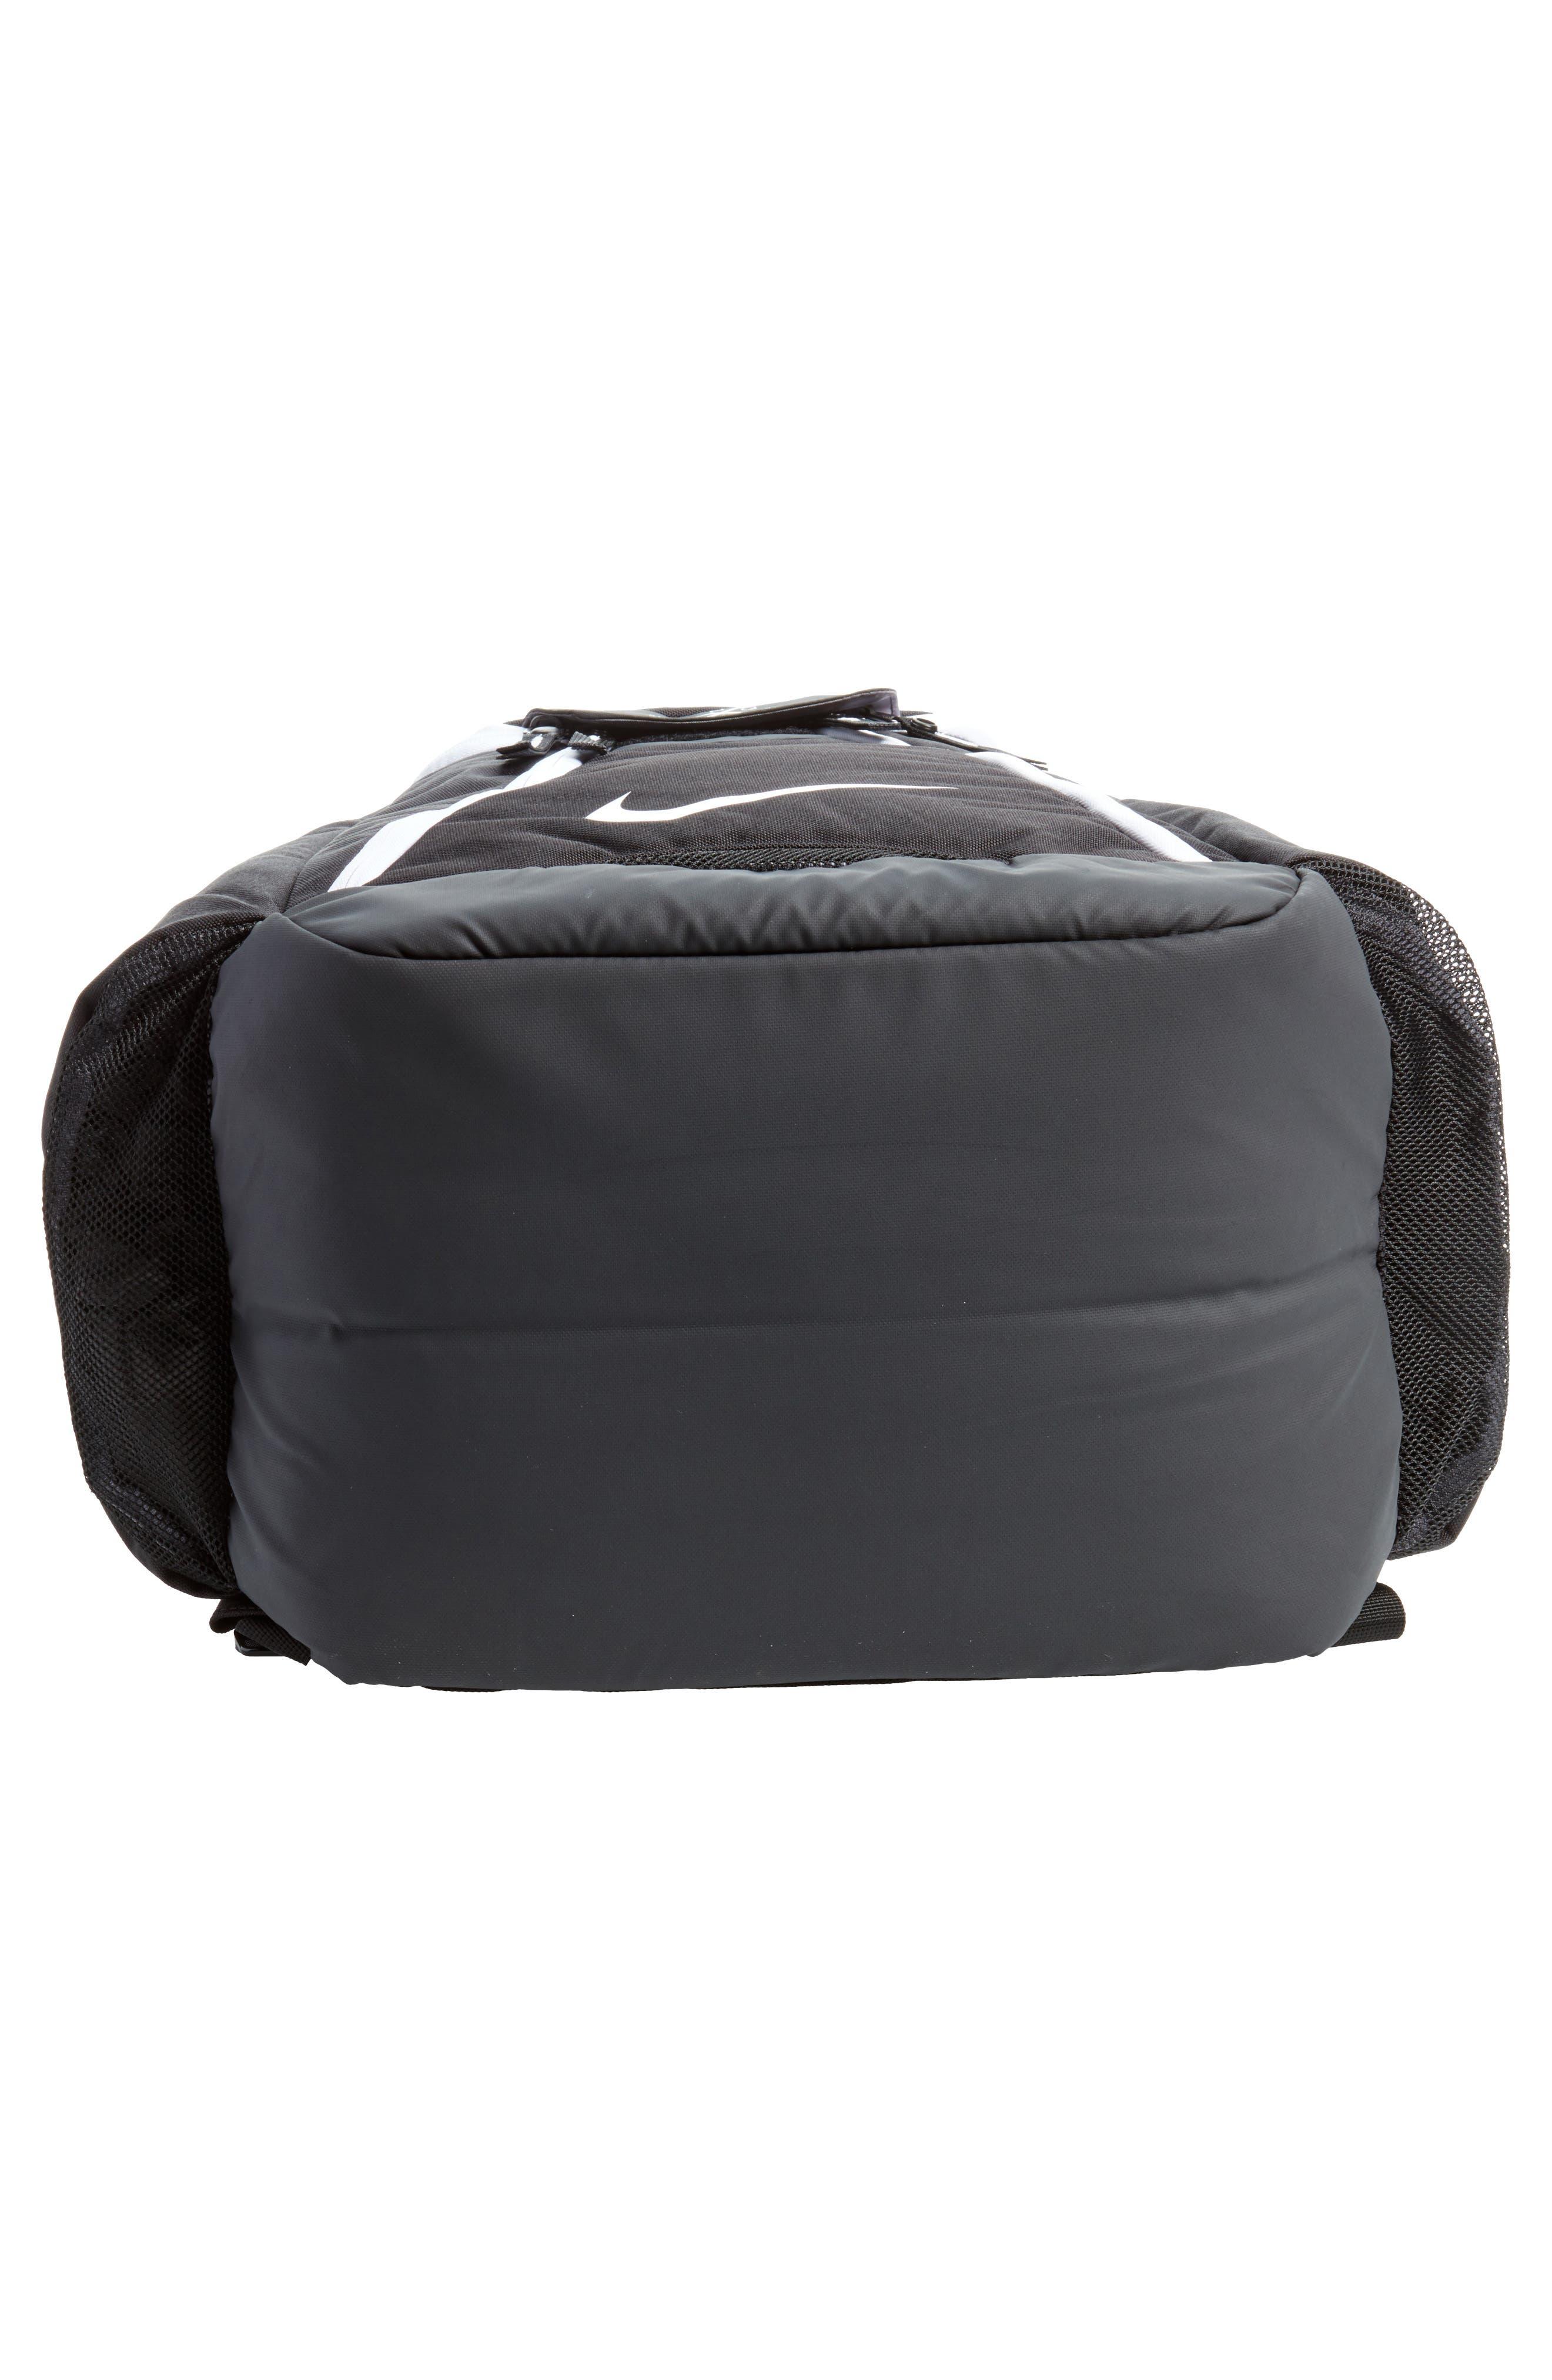 Hoops Elite Max Air Team Backpack,                             Alternate thumbnail 5, color,                             Black / White